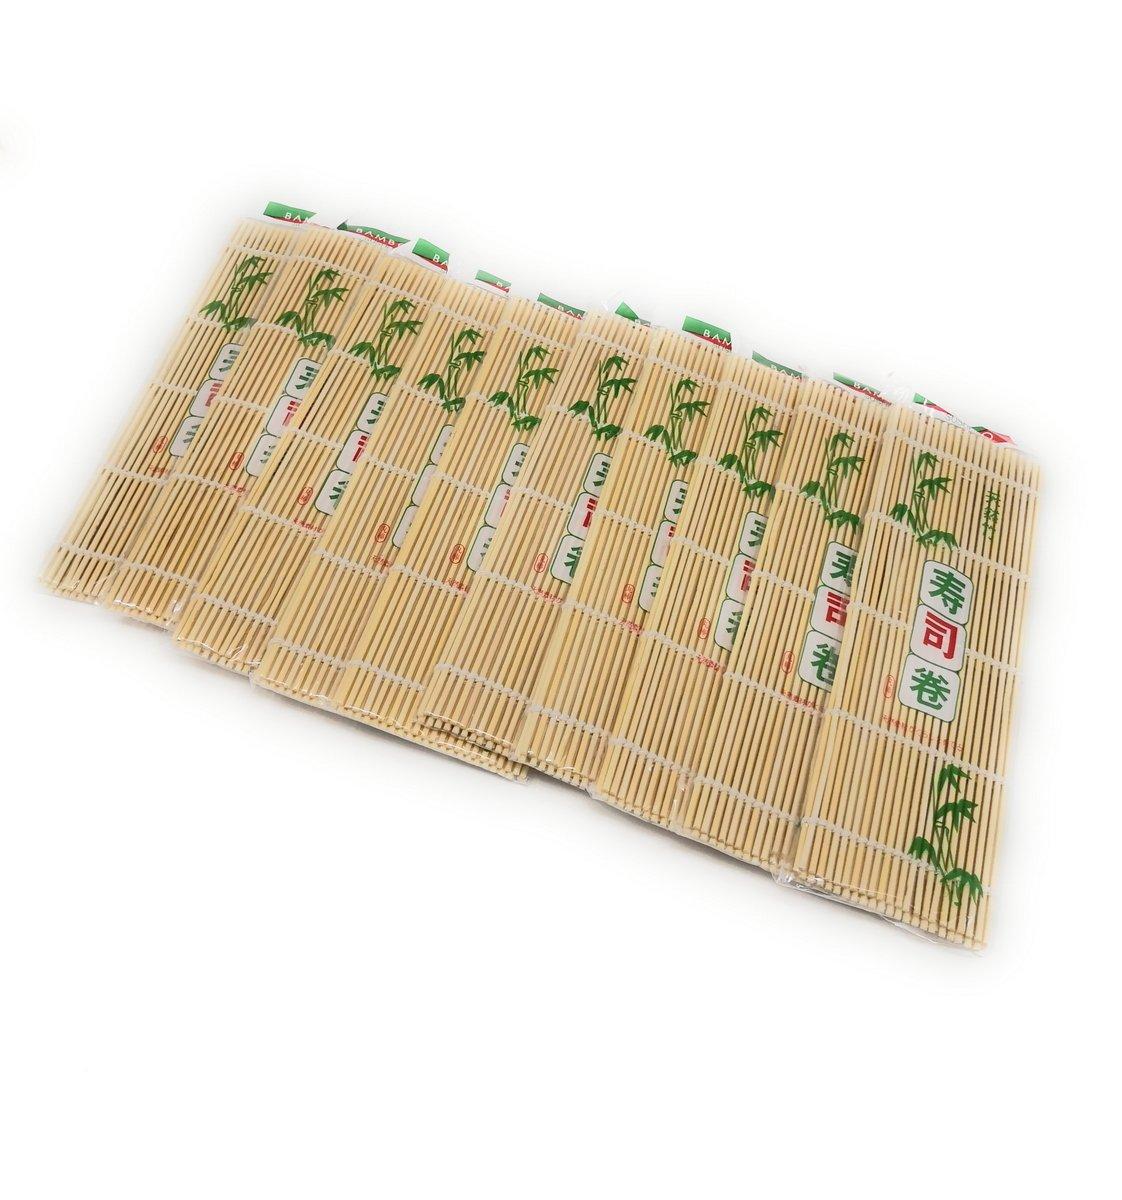 THY COLLECTIBLES Sushi Making Rolling Mat Natural Bamboo 9.5''x9.5'' 10 PCS SET